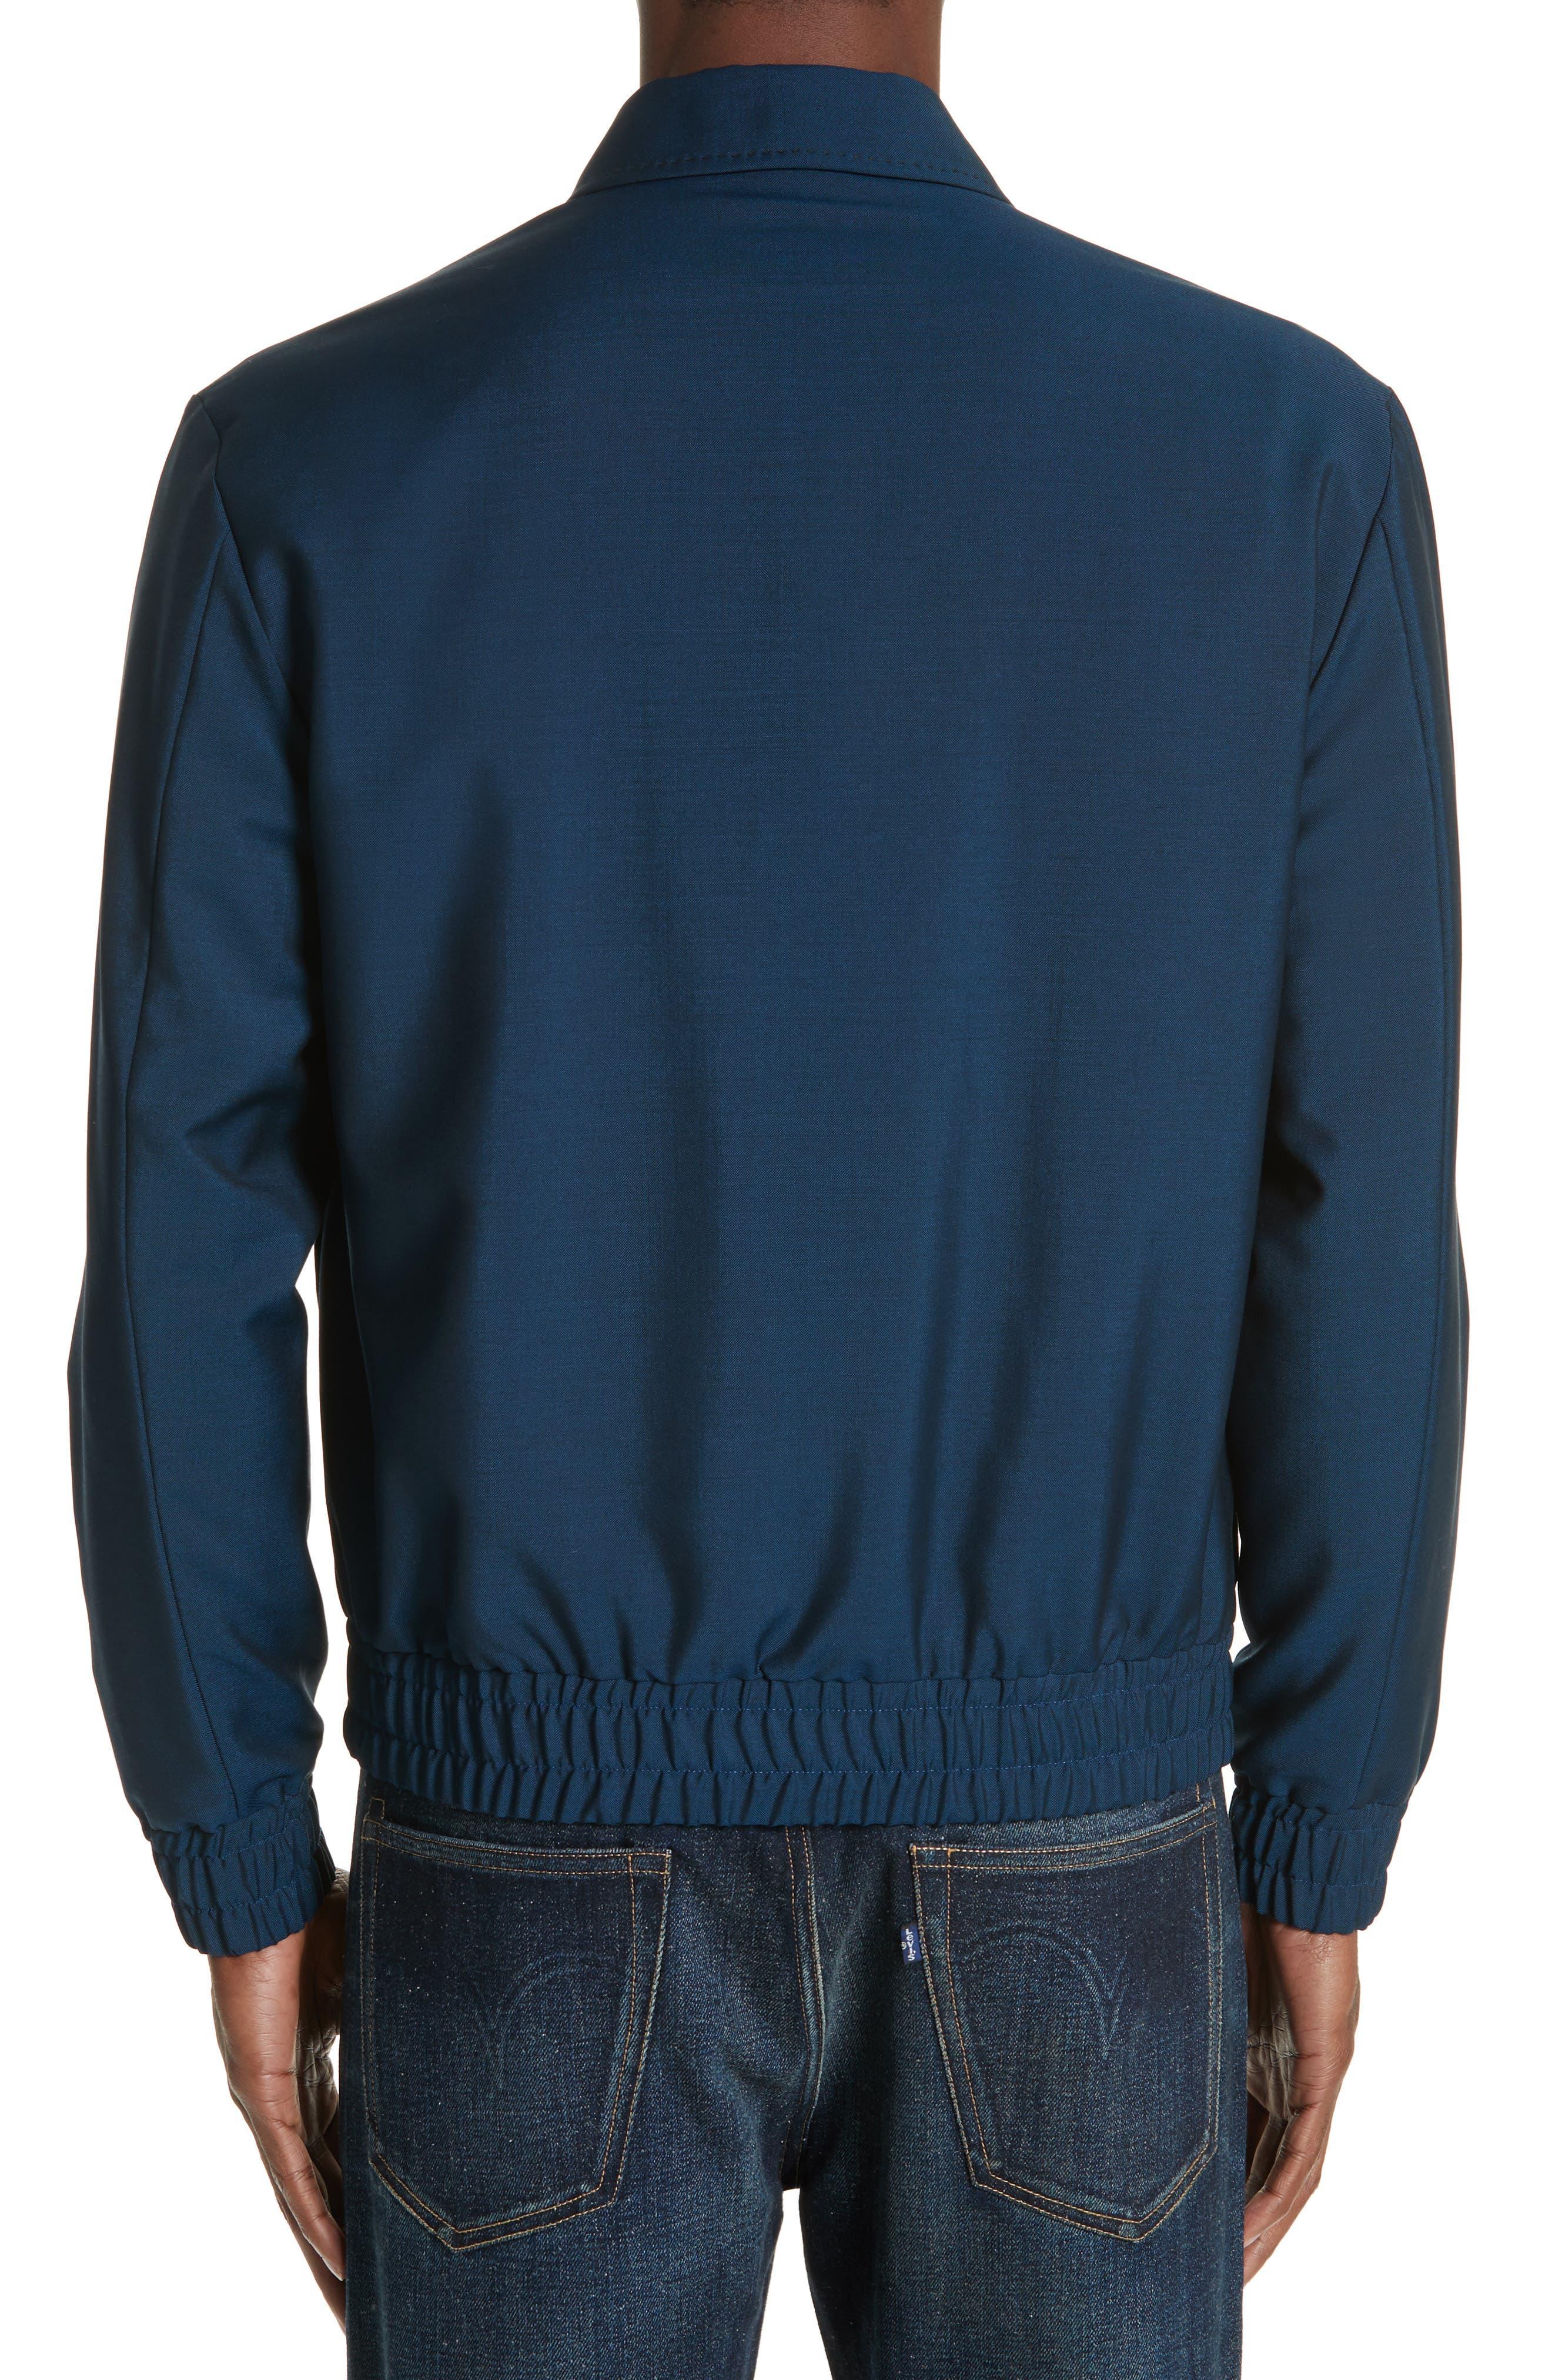 KENZO, Zip Jacket, Alternate thumbnail 2, color, DUCK BLUE